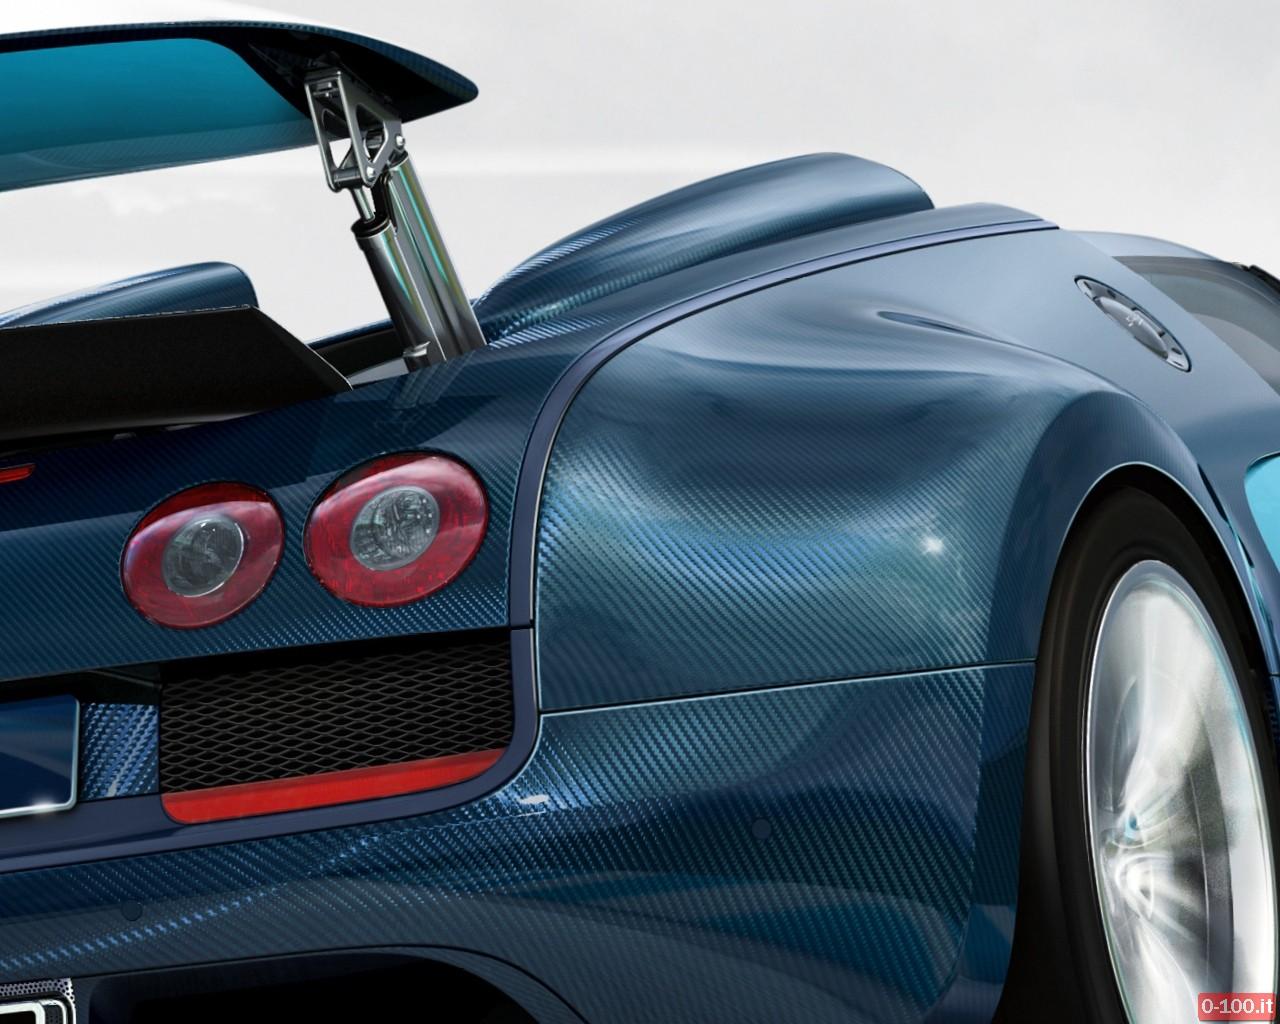 bugatti-veyron-legend-jean-pierre-wimille-0-100_5